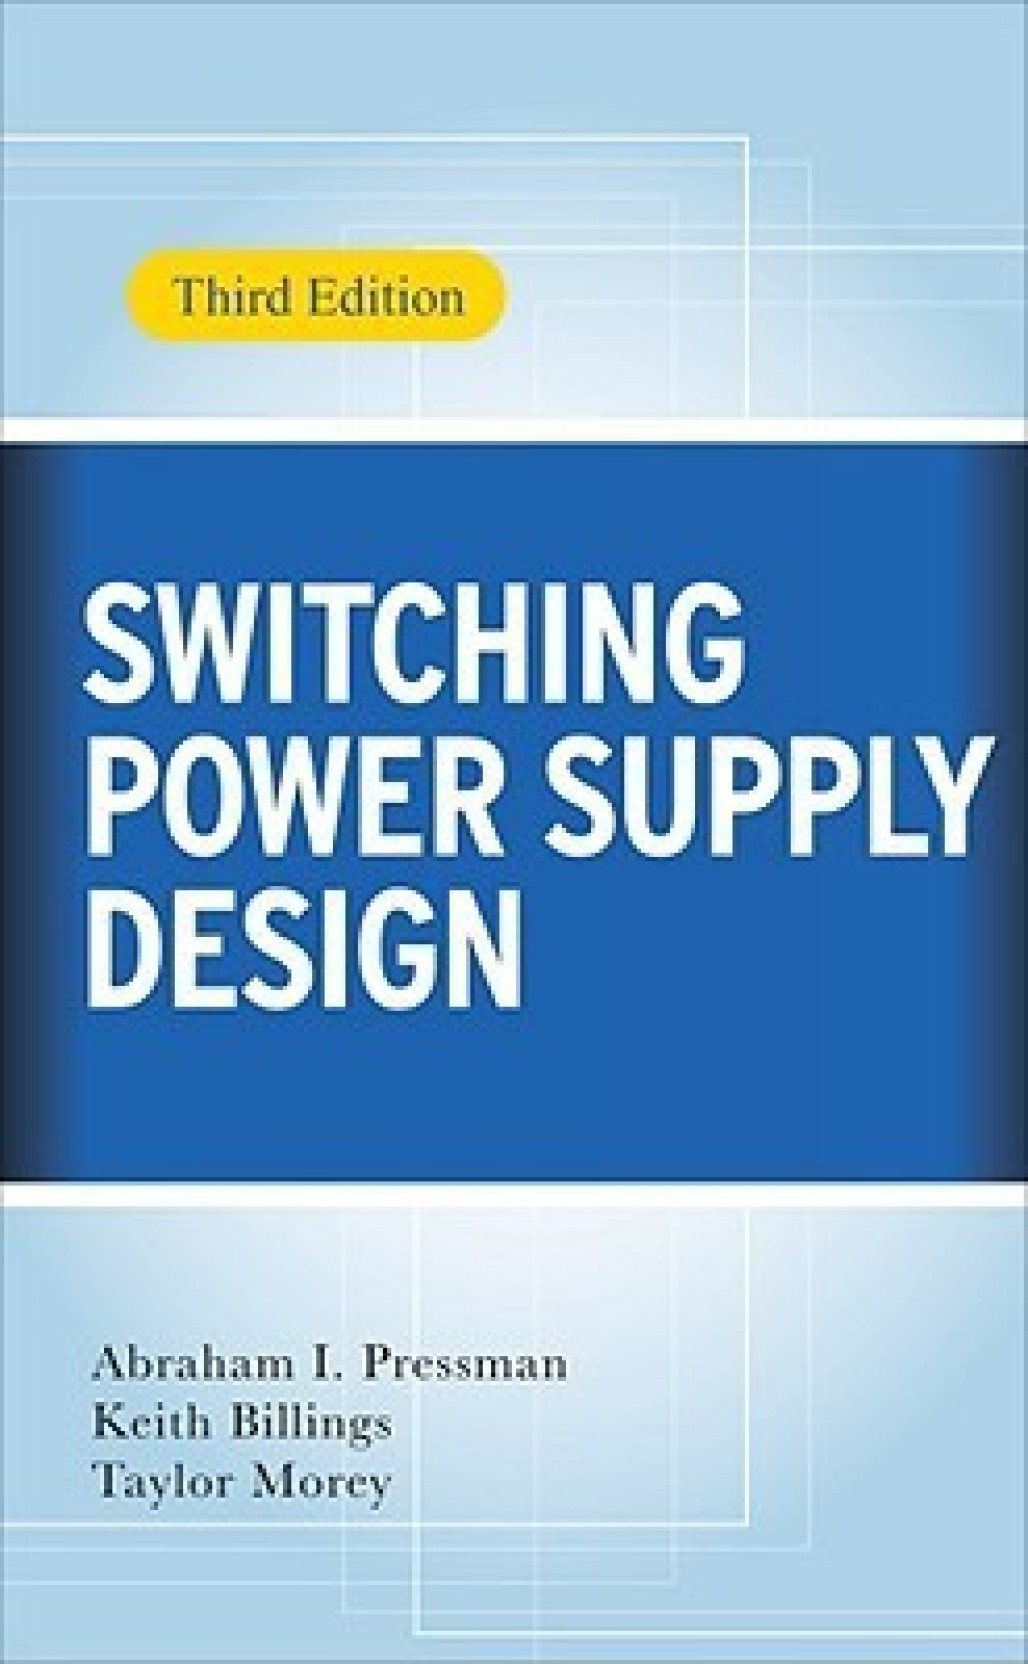 Switching Power Supply Design - Buy Switching Power Supply Design ...